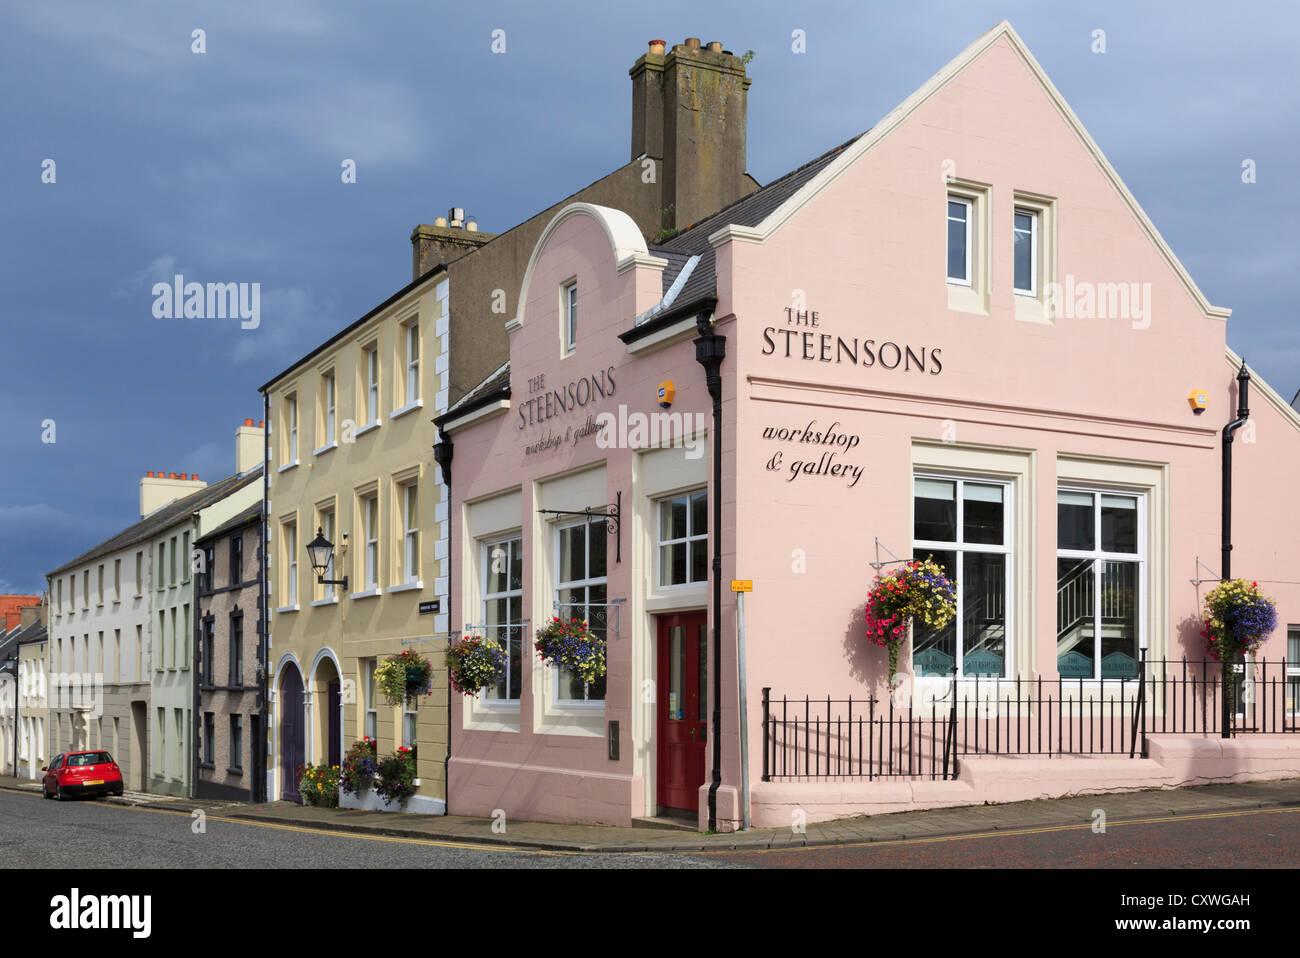 Steenson's goldsmiths workshop and gallery in Glenarm, County Antrim, Northern Ireland, UK - Stock Image